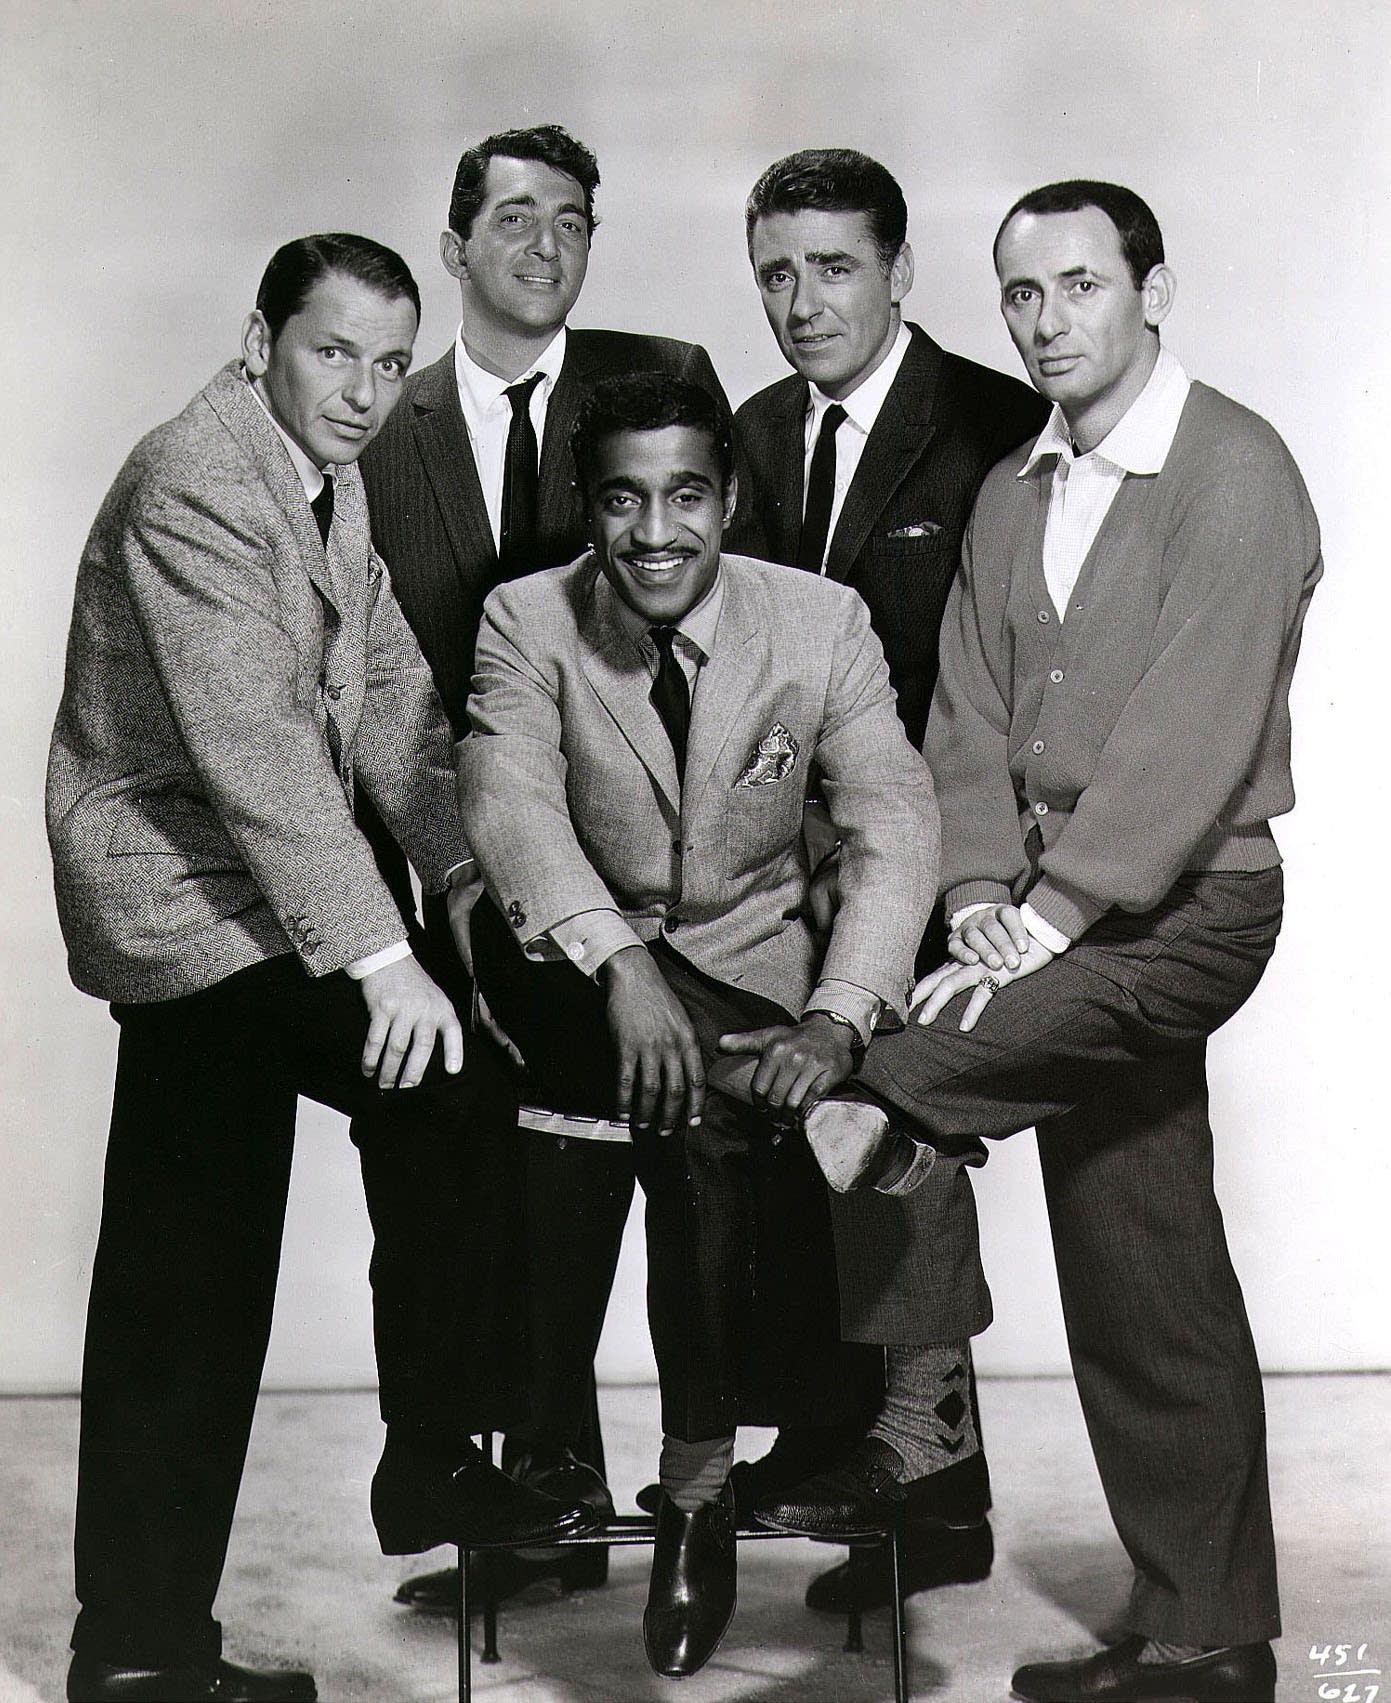 Frank Sinatra photo - The Rat Pack